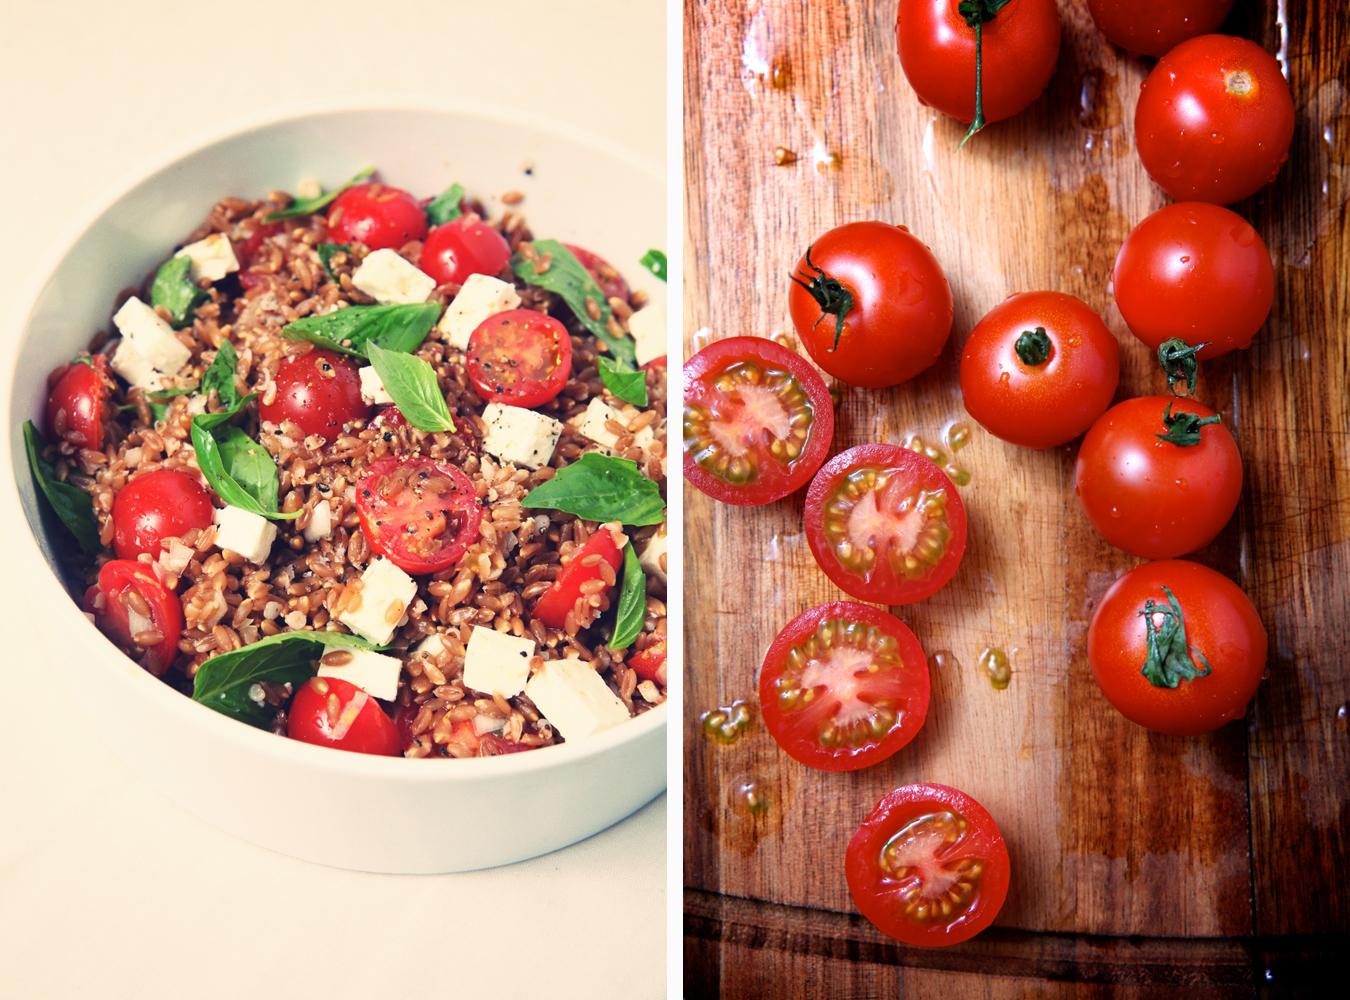 Warm Farro Salad with Cherry Tomatoes, Basil & Feta